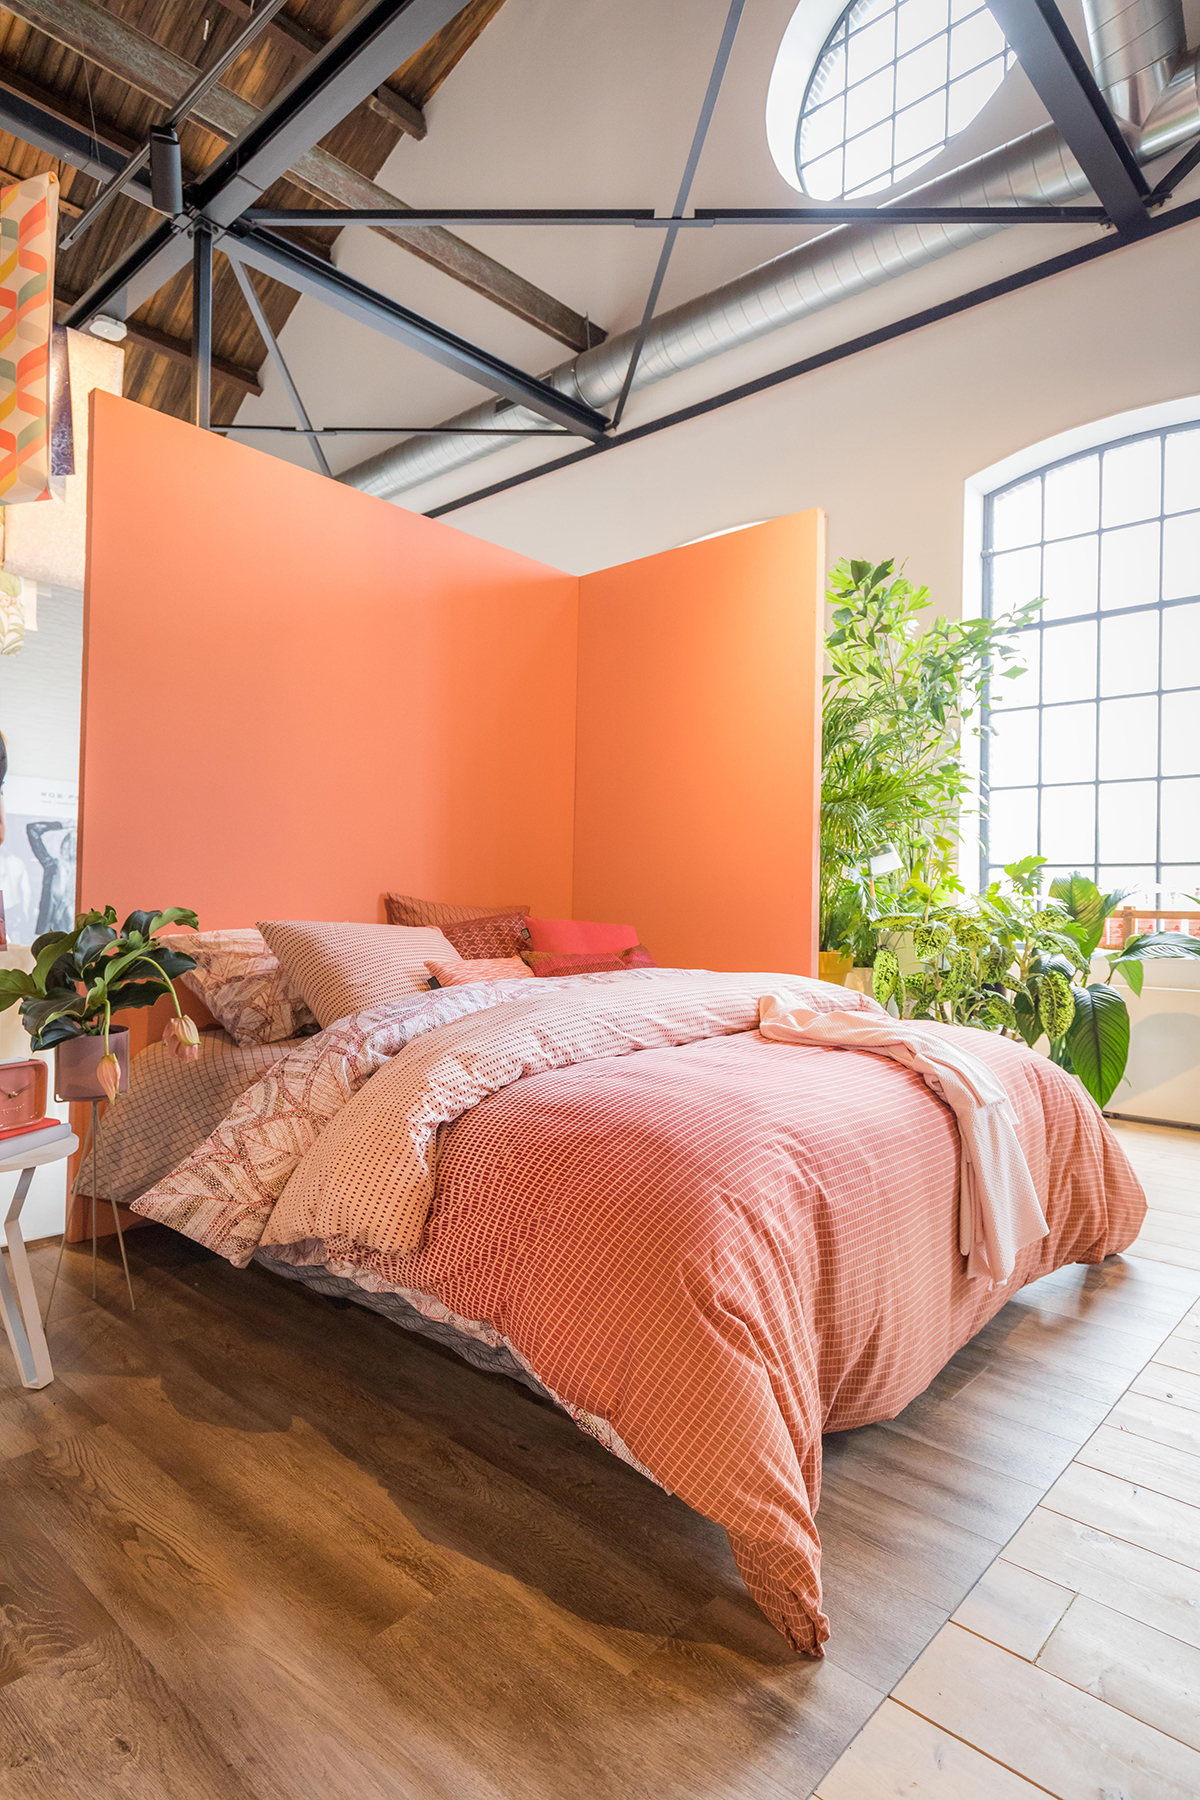 Beddinghouse, Home Comfort Press inspiratie dagen, interieur inspiratie, blog sarah watts